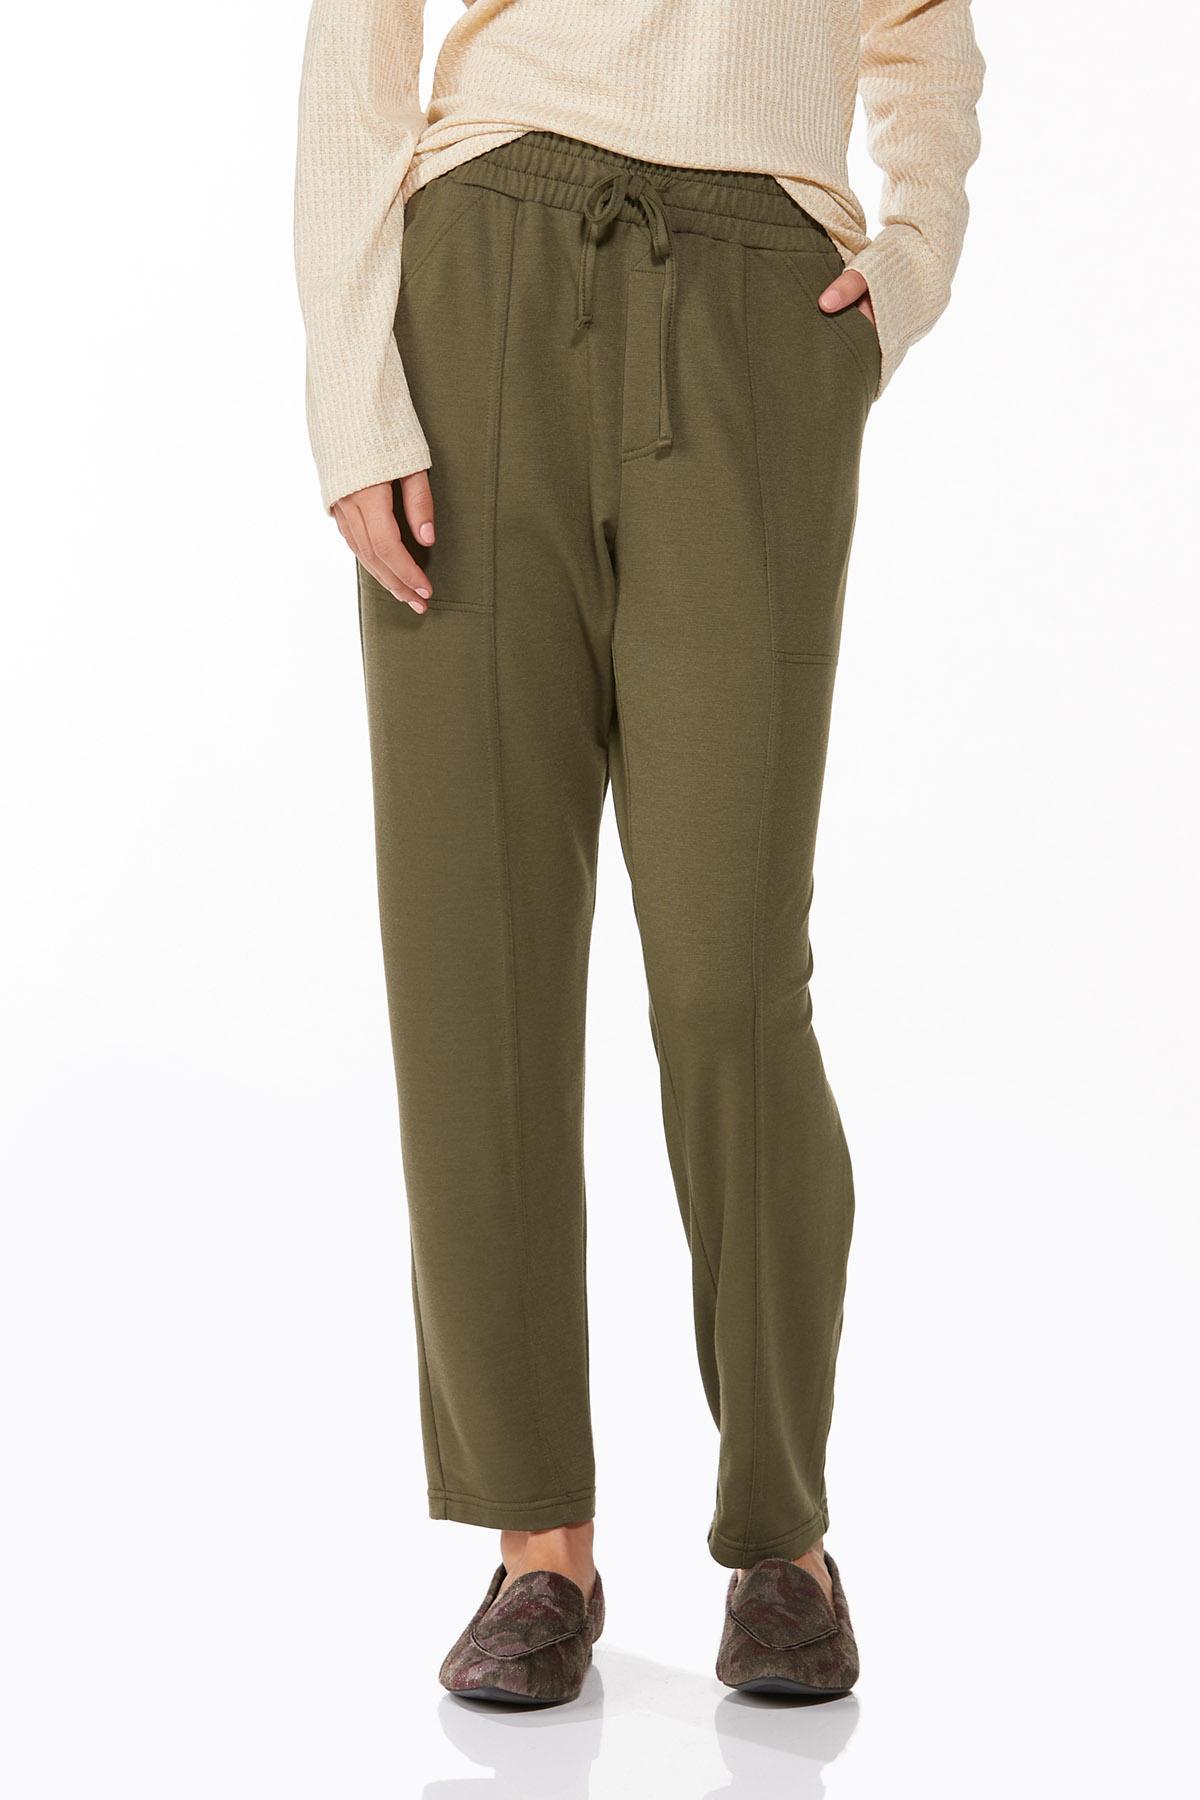 Soft Olive Pants (Item #44655246)